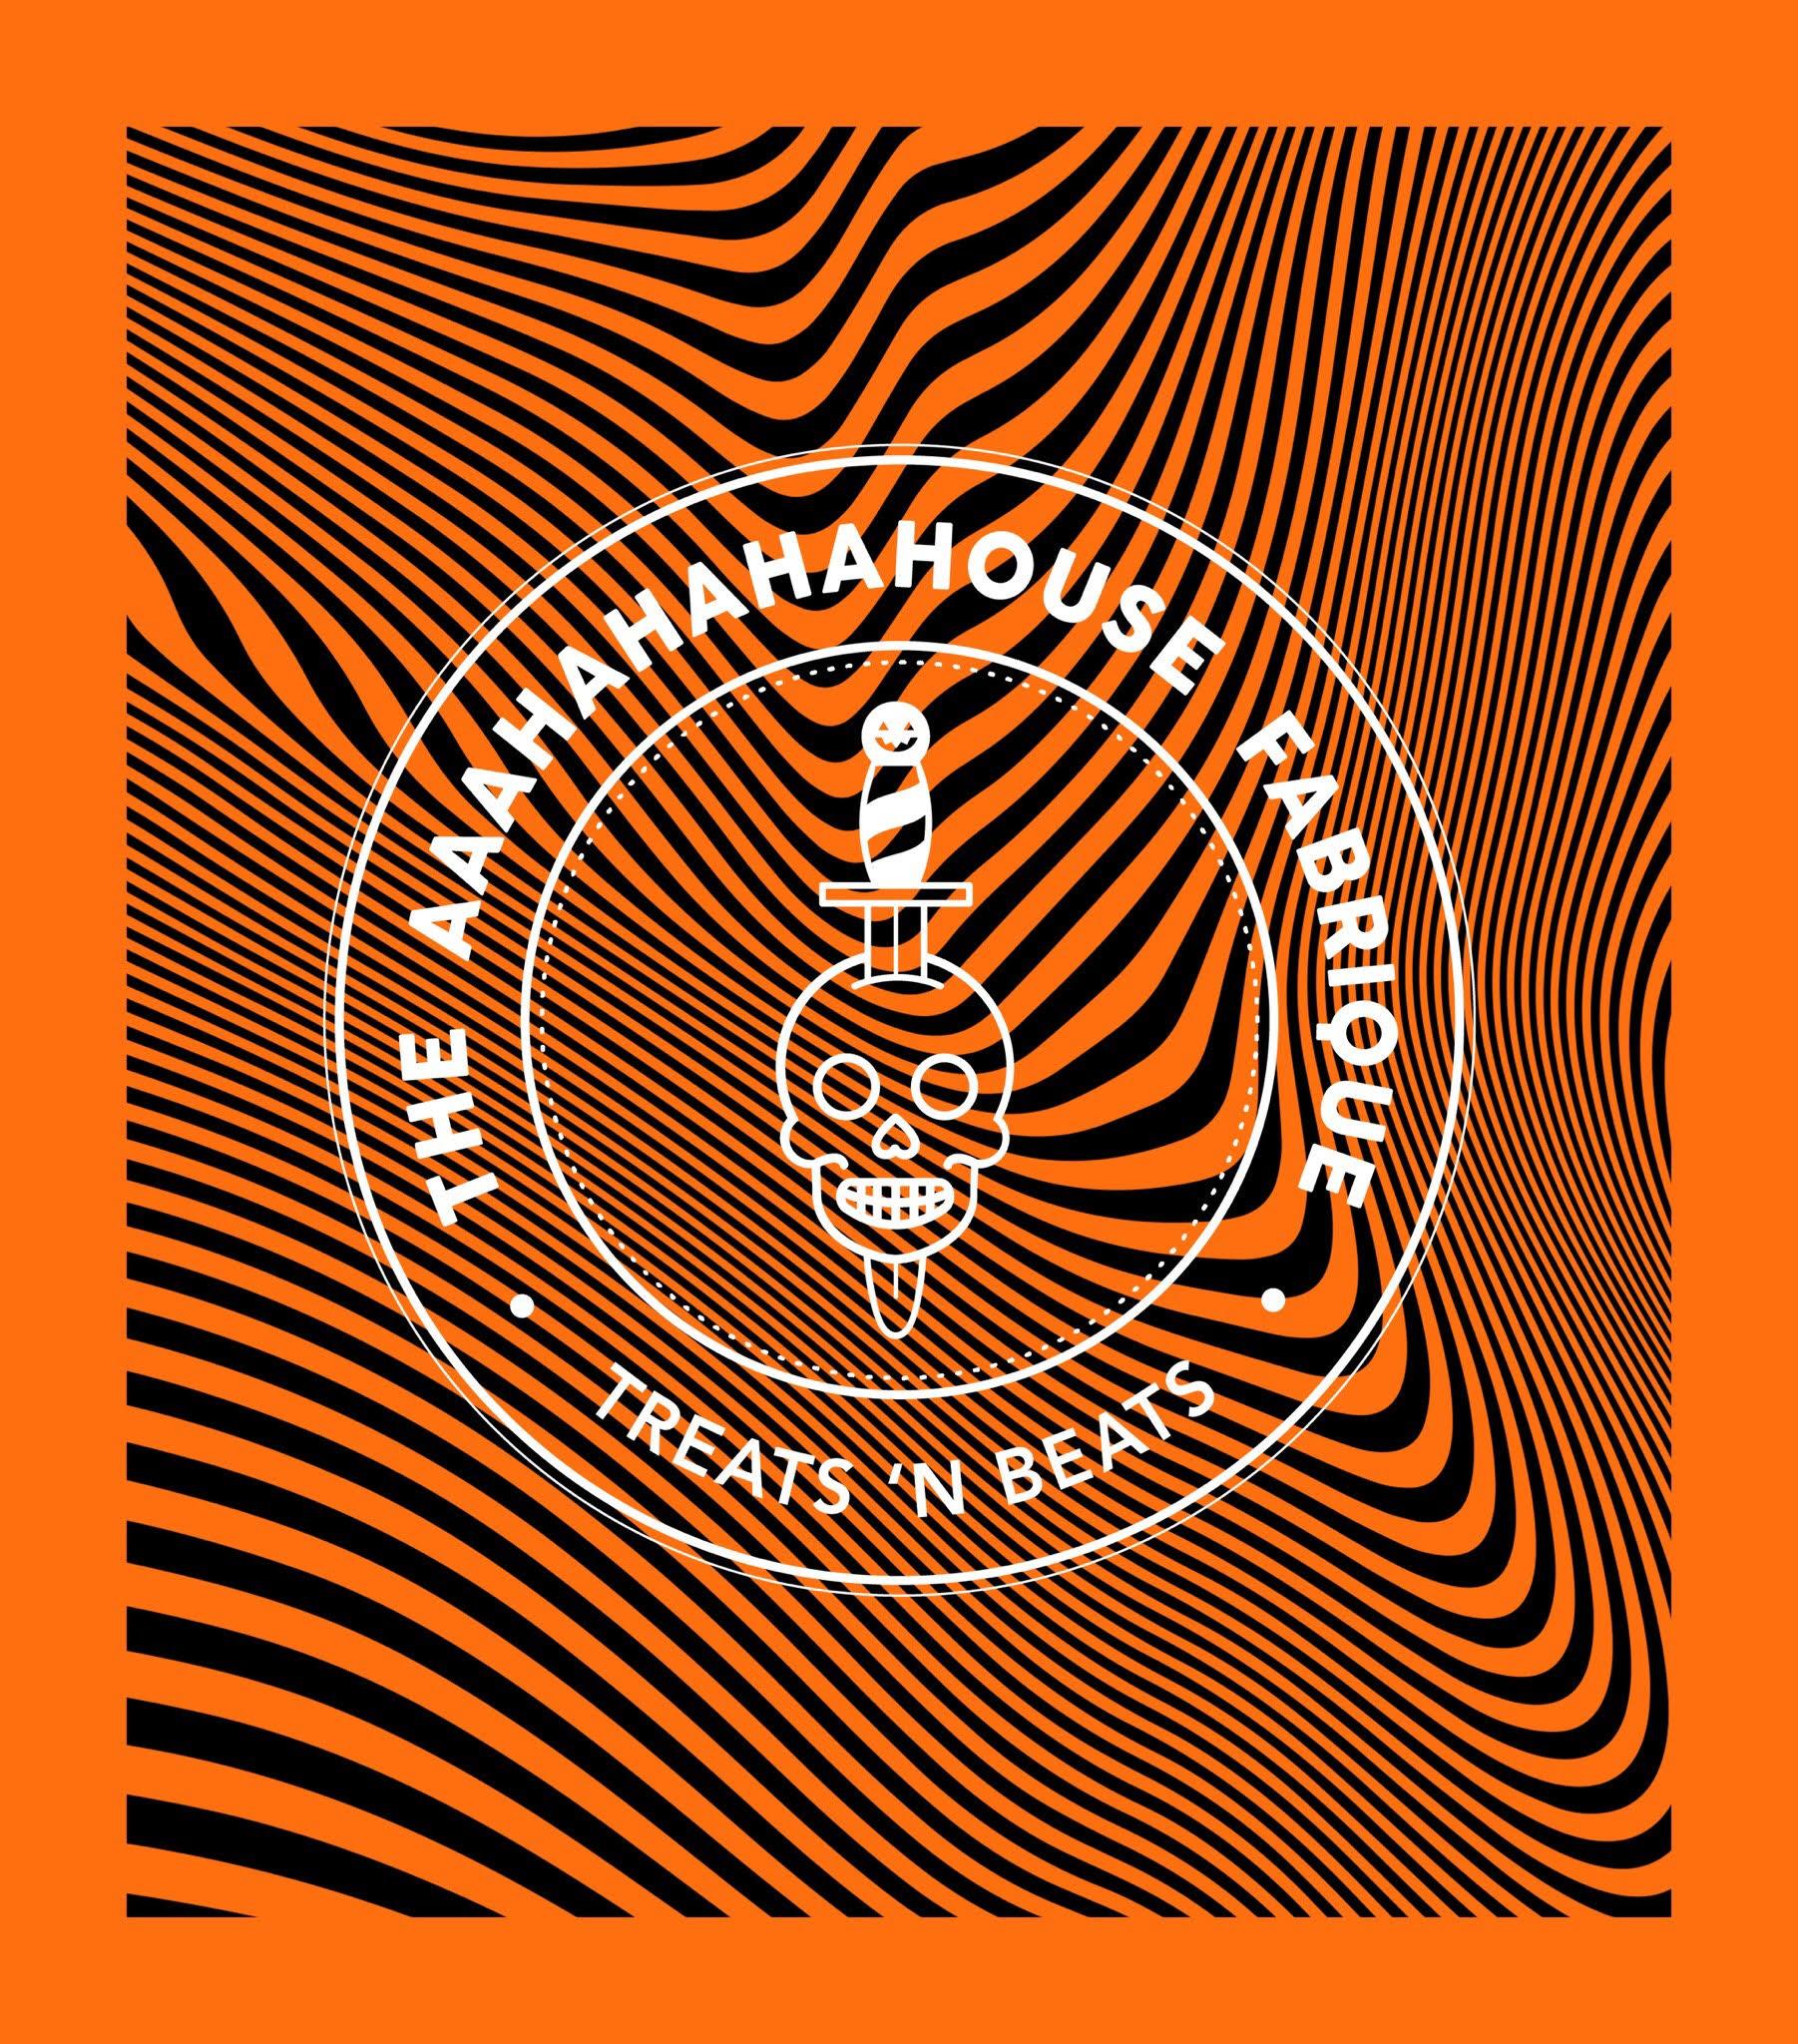 The House Fabrique 2 Halloween Edition Vrijdag 26 Oktober 2018